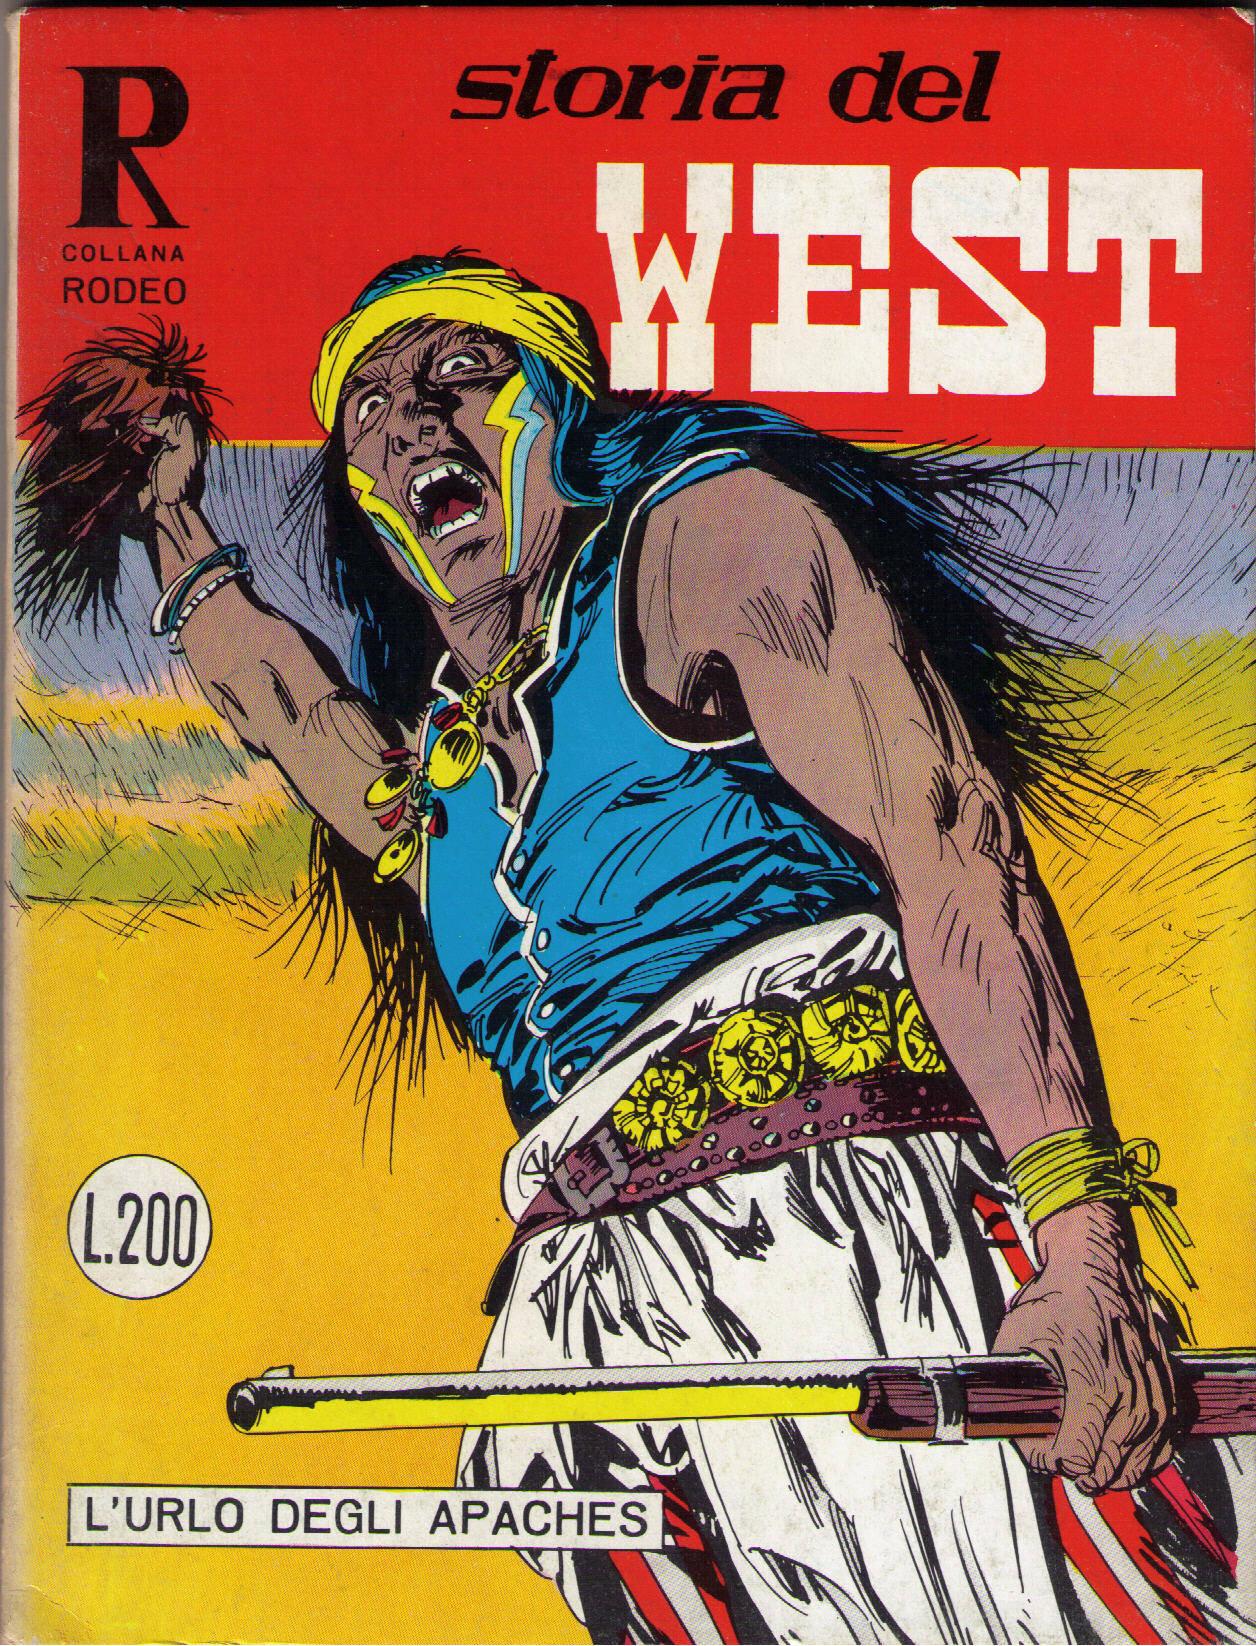 Storia del West n.29 (collana Rodeo n.65)